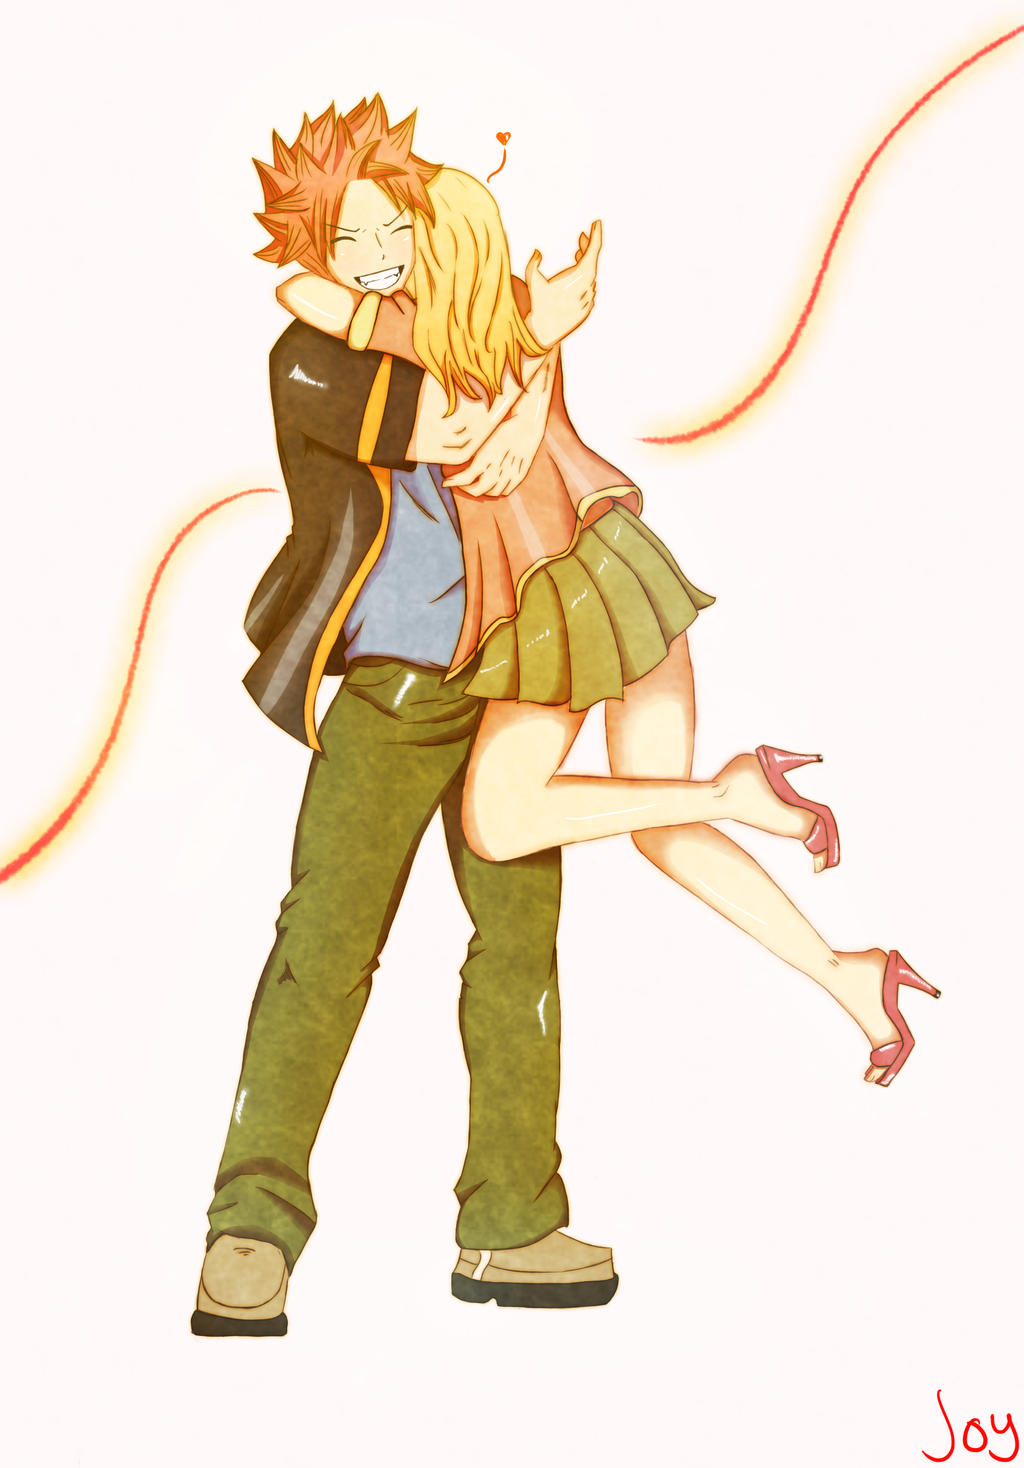 Happy valentines day by joyfuleejoyful on deviantart - Happy valentines day anime ...